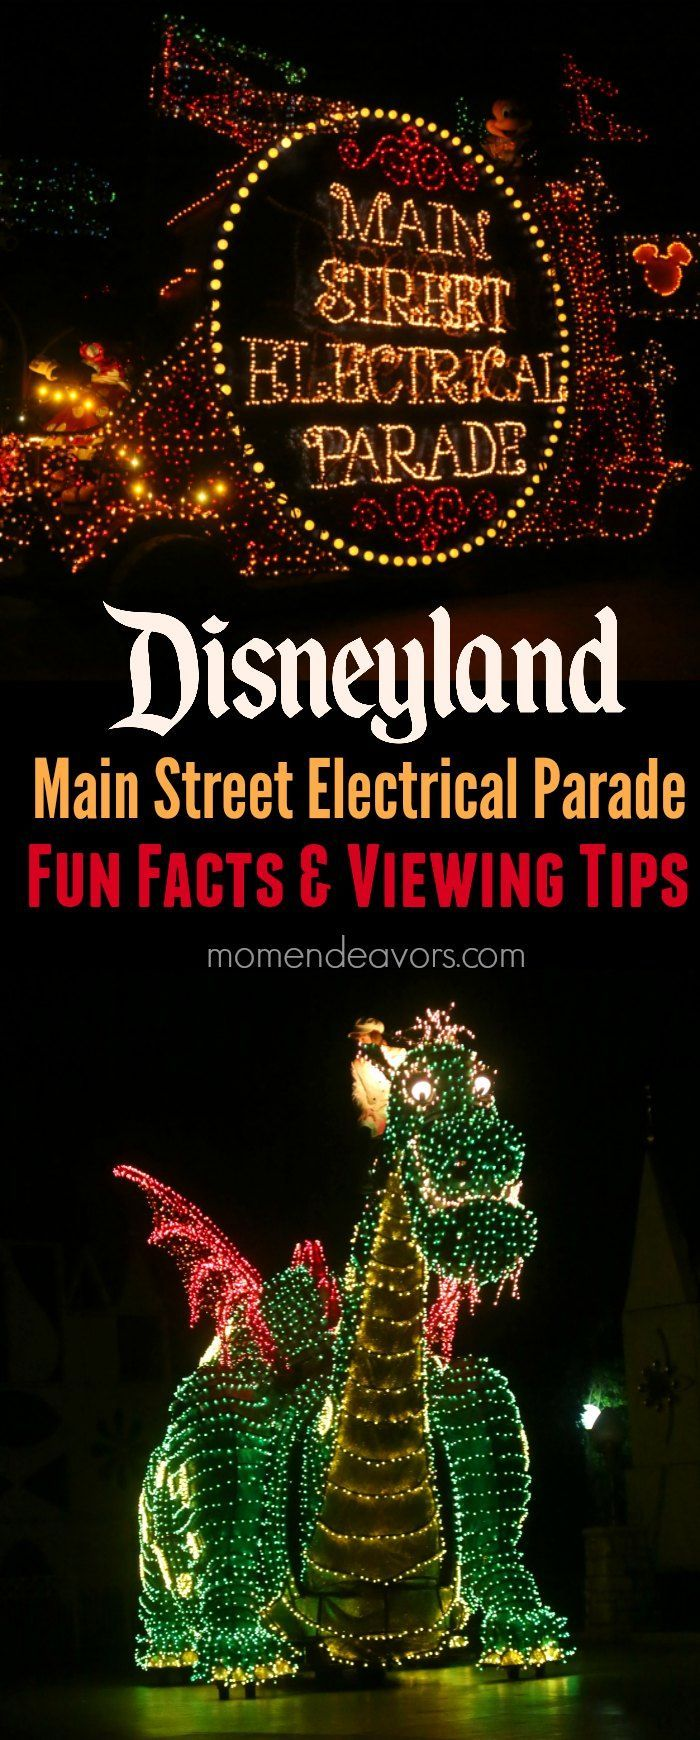 Disneyland Main Street Electrical Parade Fun Facts & Viewing Tips